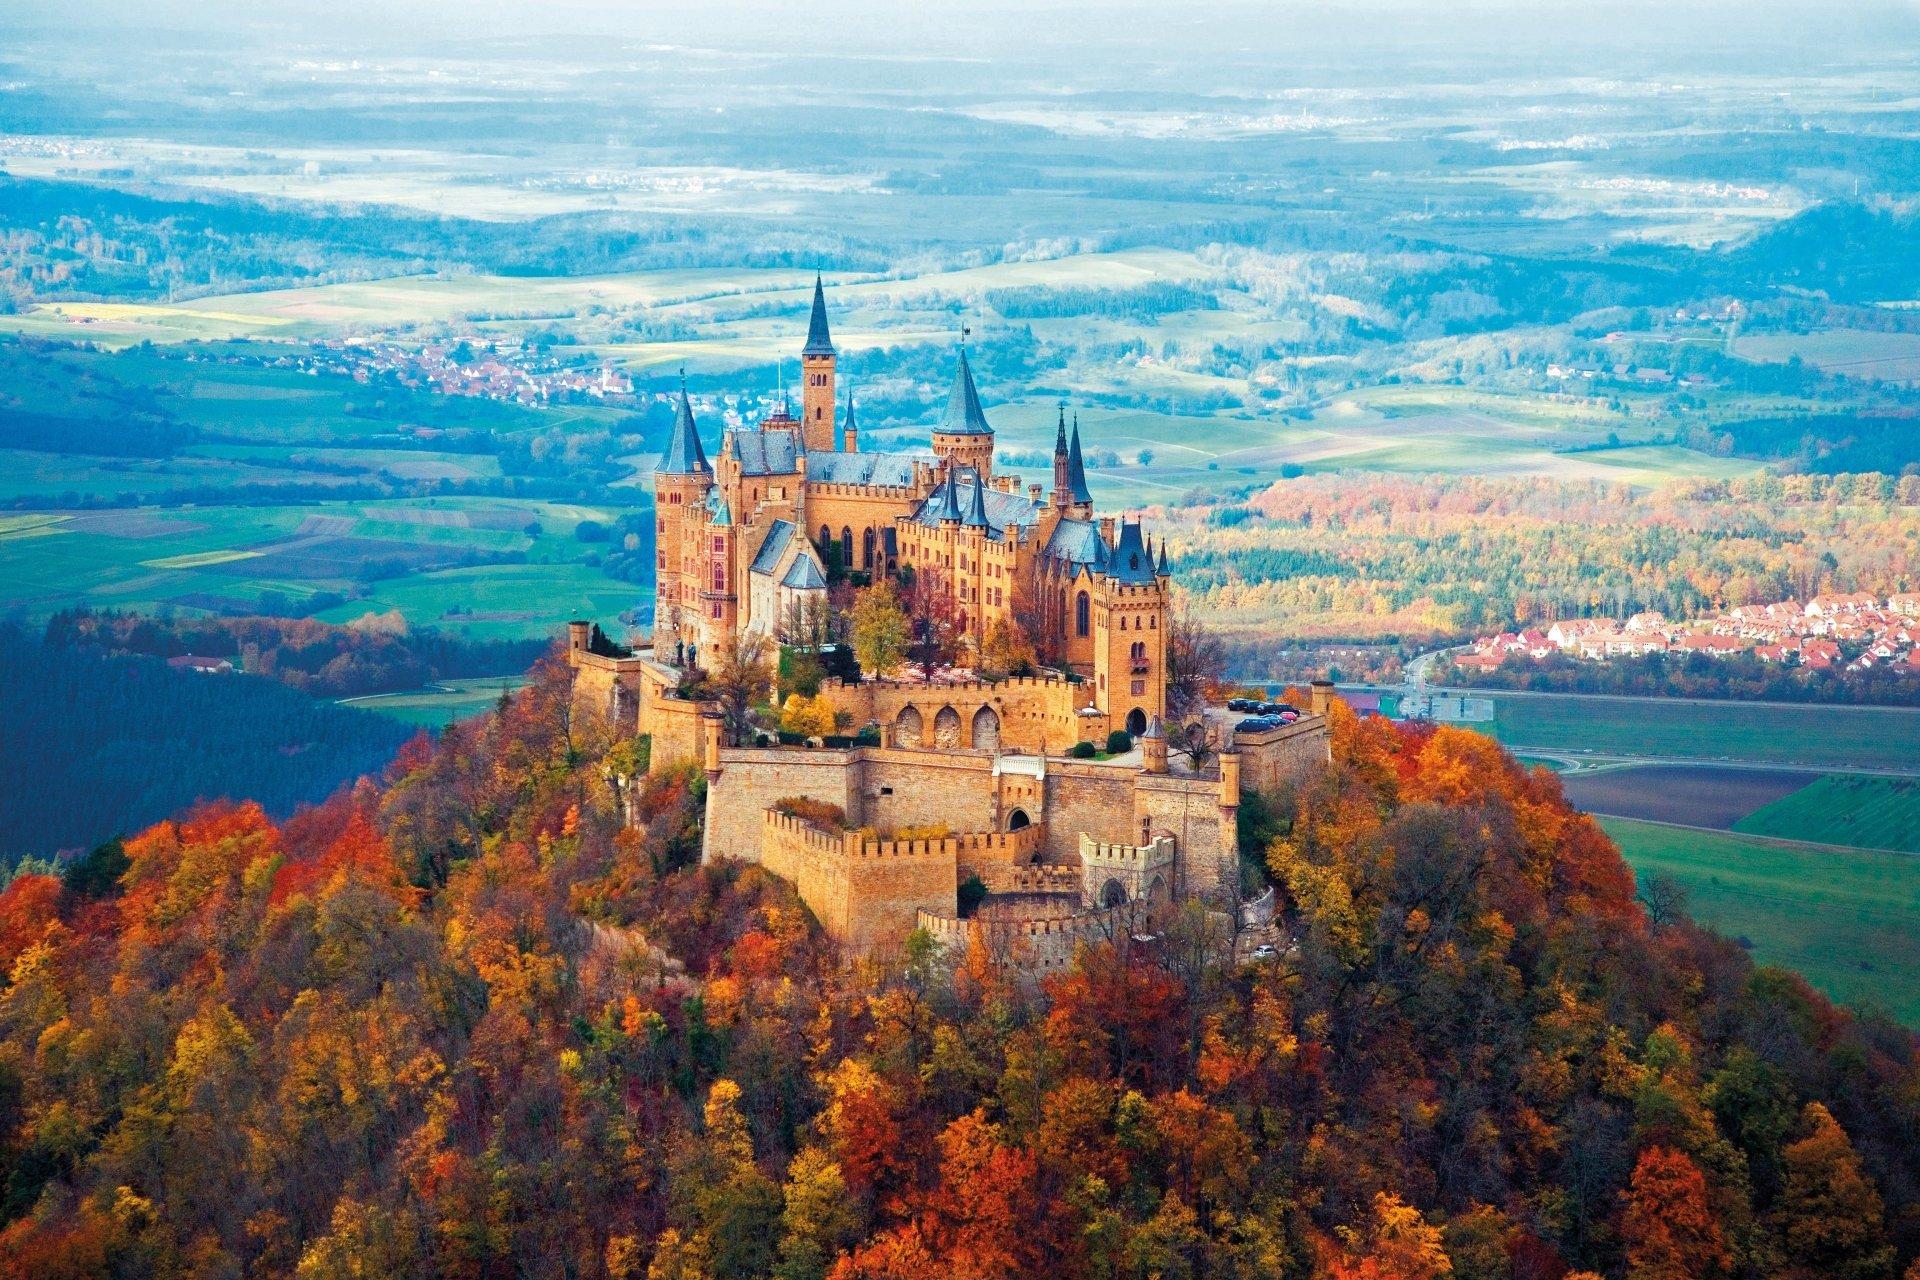 Fall Foliage Wallpaper Widescreen Hohenzollern Castle In The Fall 4k Ultra Hd Wallpaper